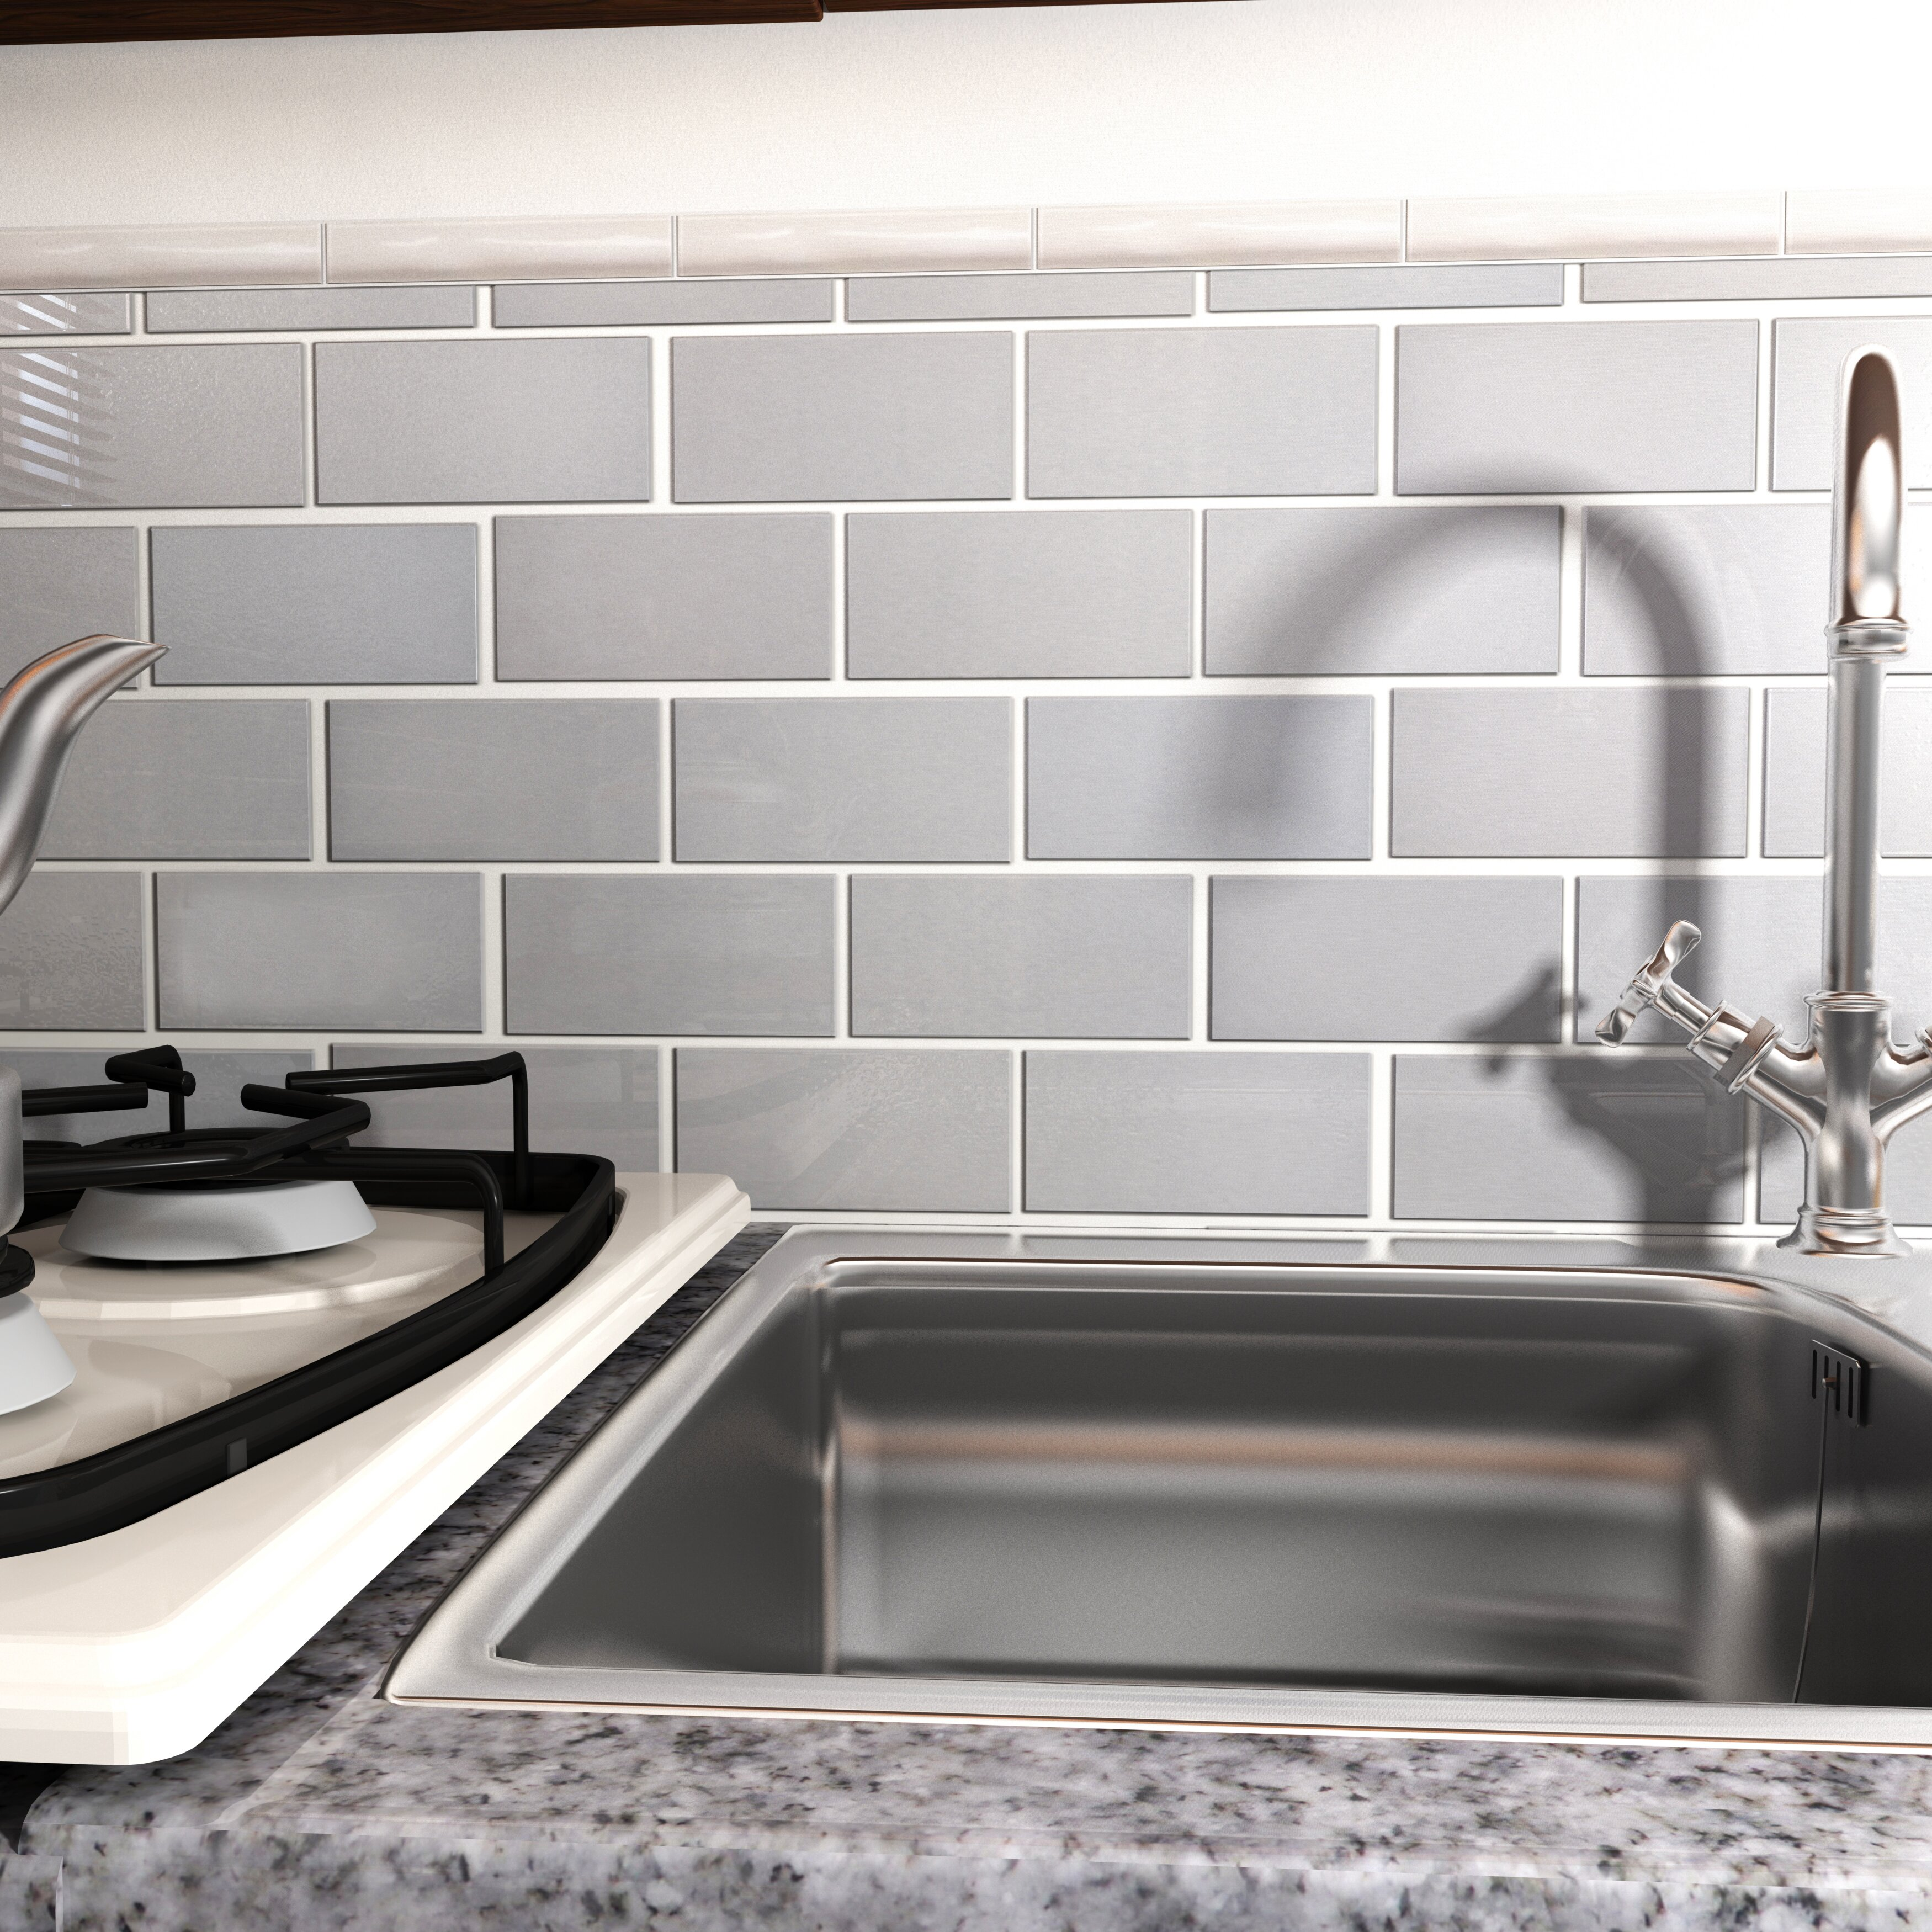 "Ceramic Subway Tile Kitchen Backsplash: EliteTile Vulcan 3"" X 6"" Stainless Steel Over Porcelain"